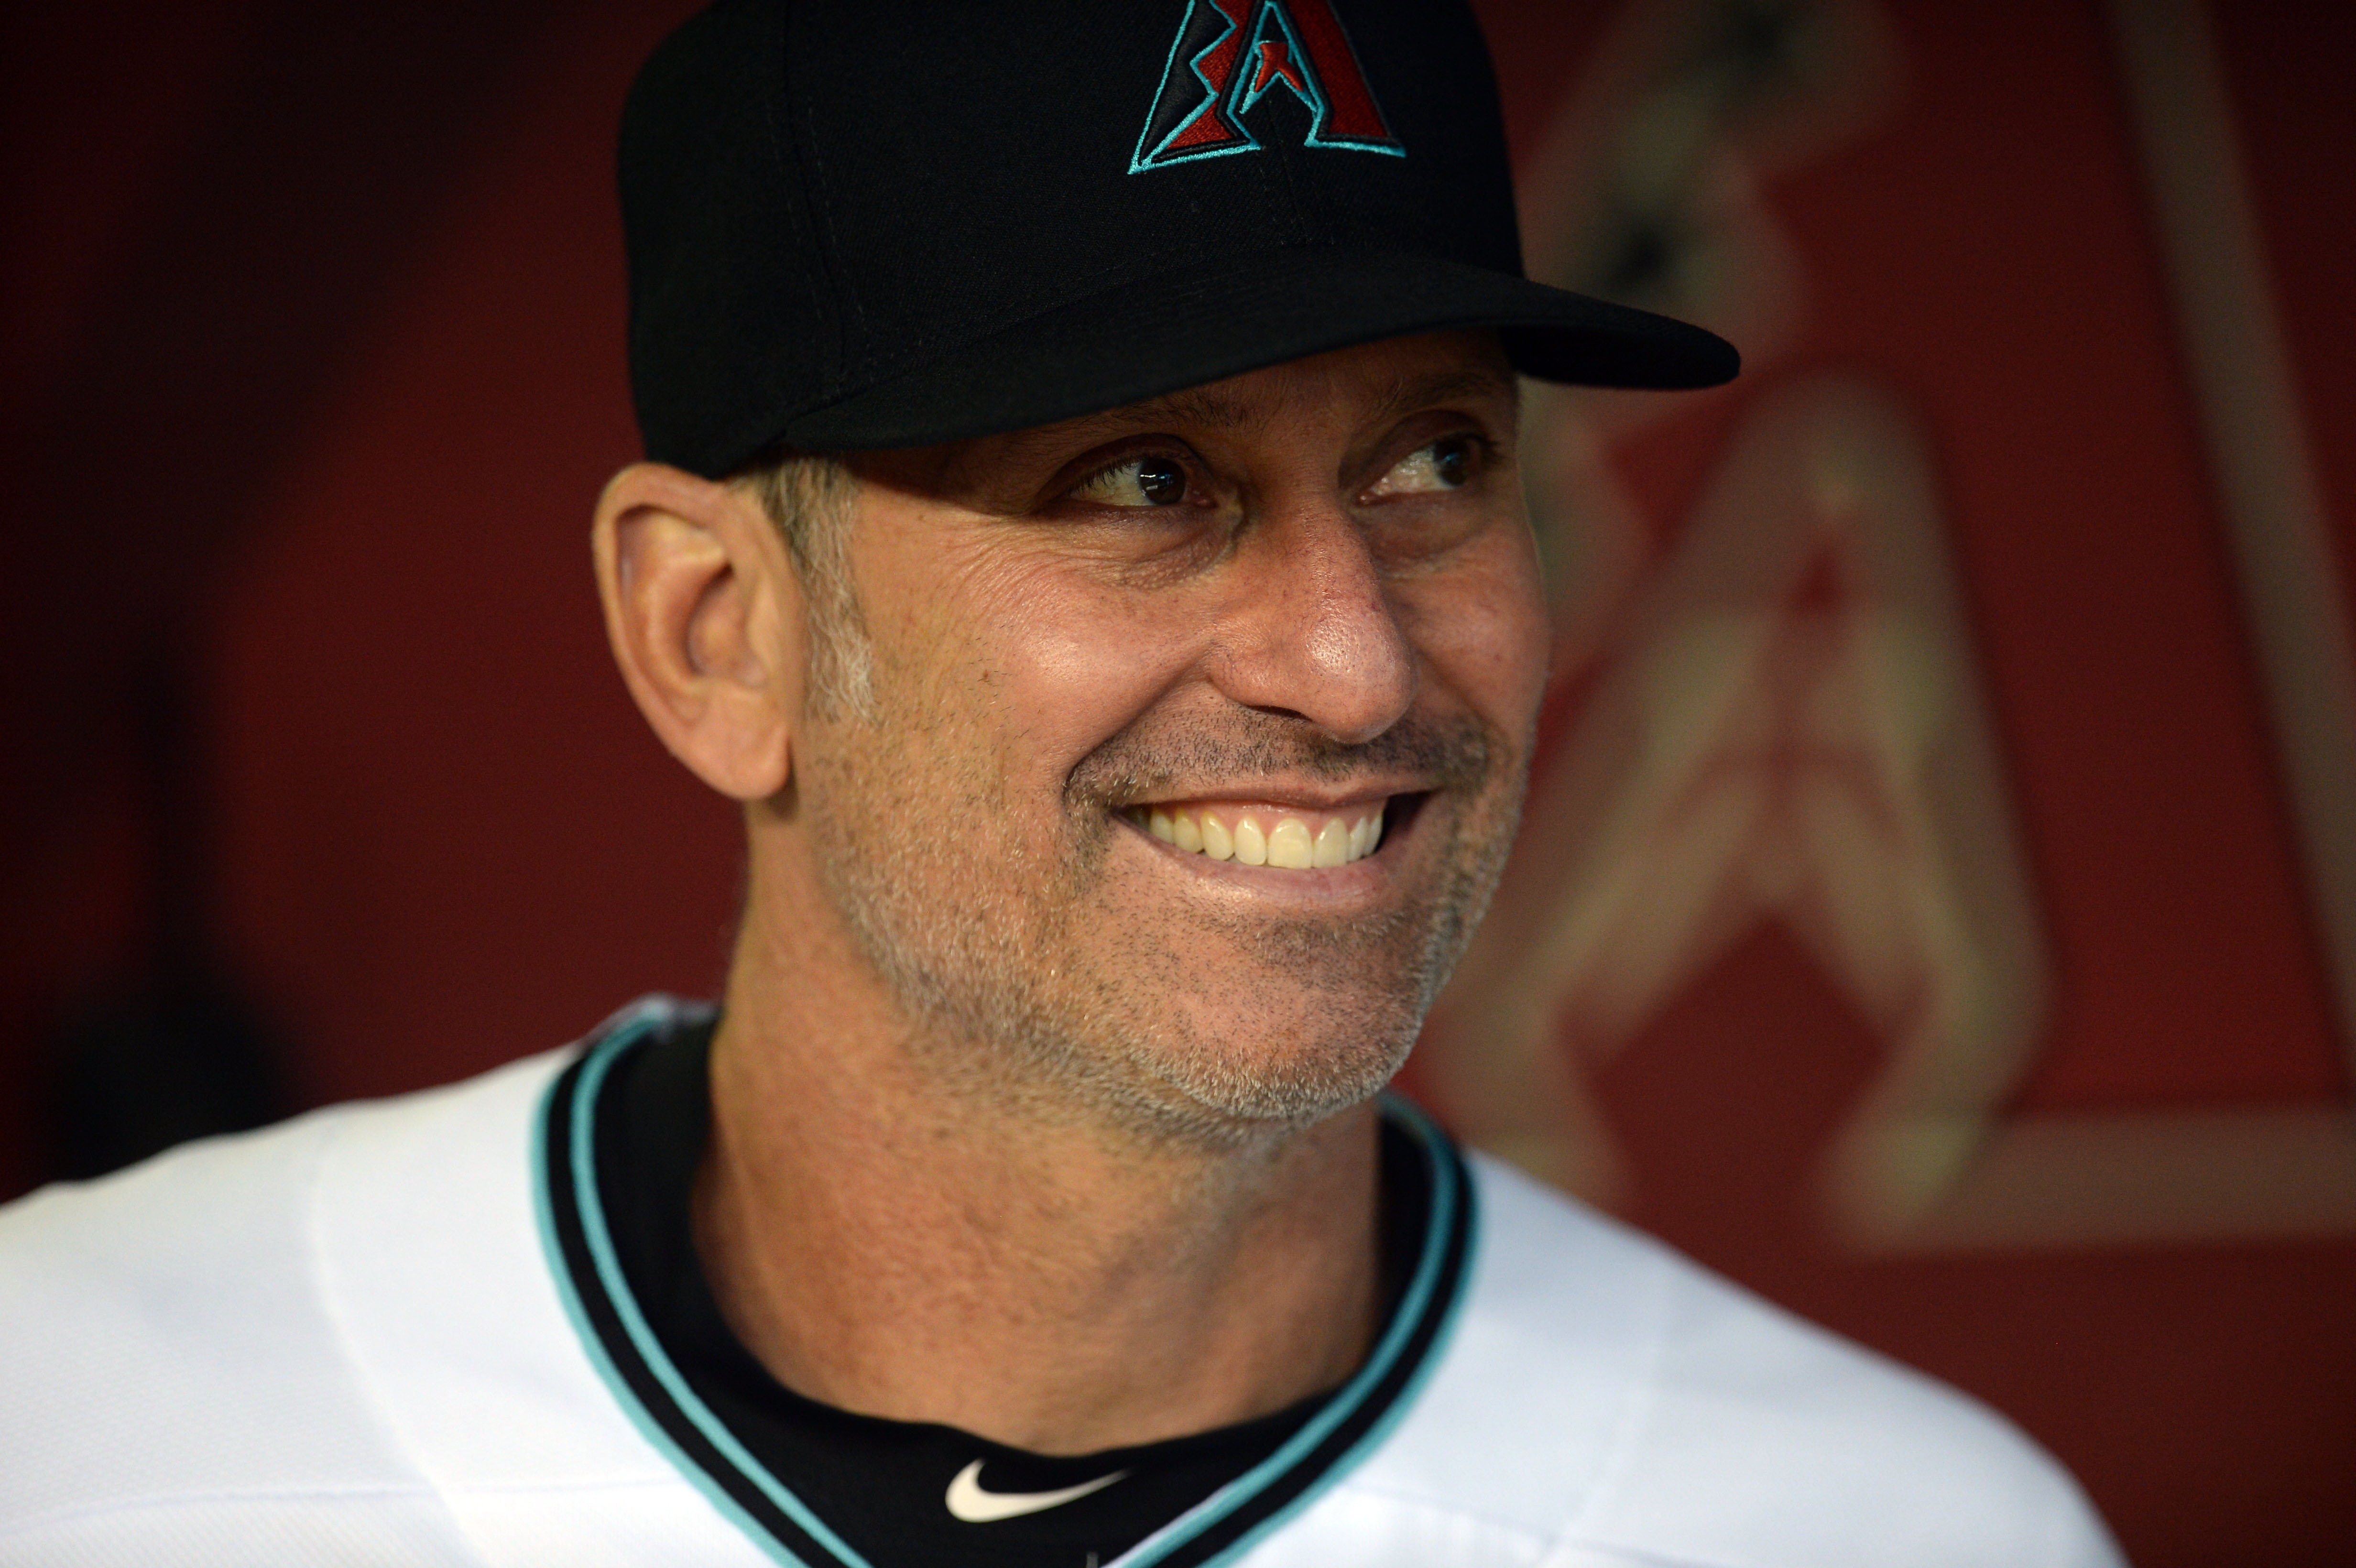 MLB: Miami Marlins at Arizona Diamondbacks